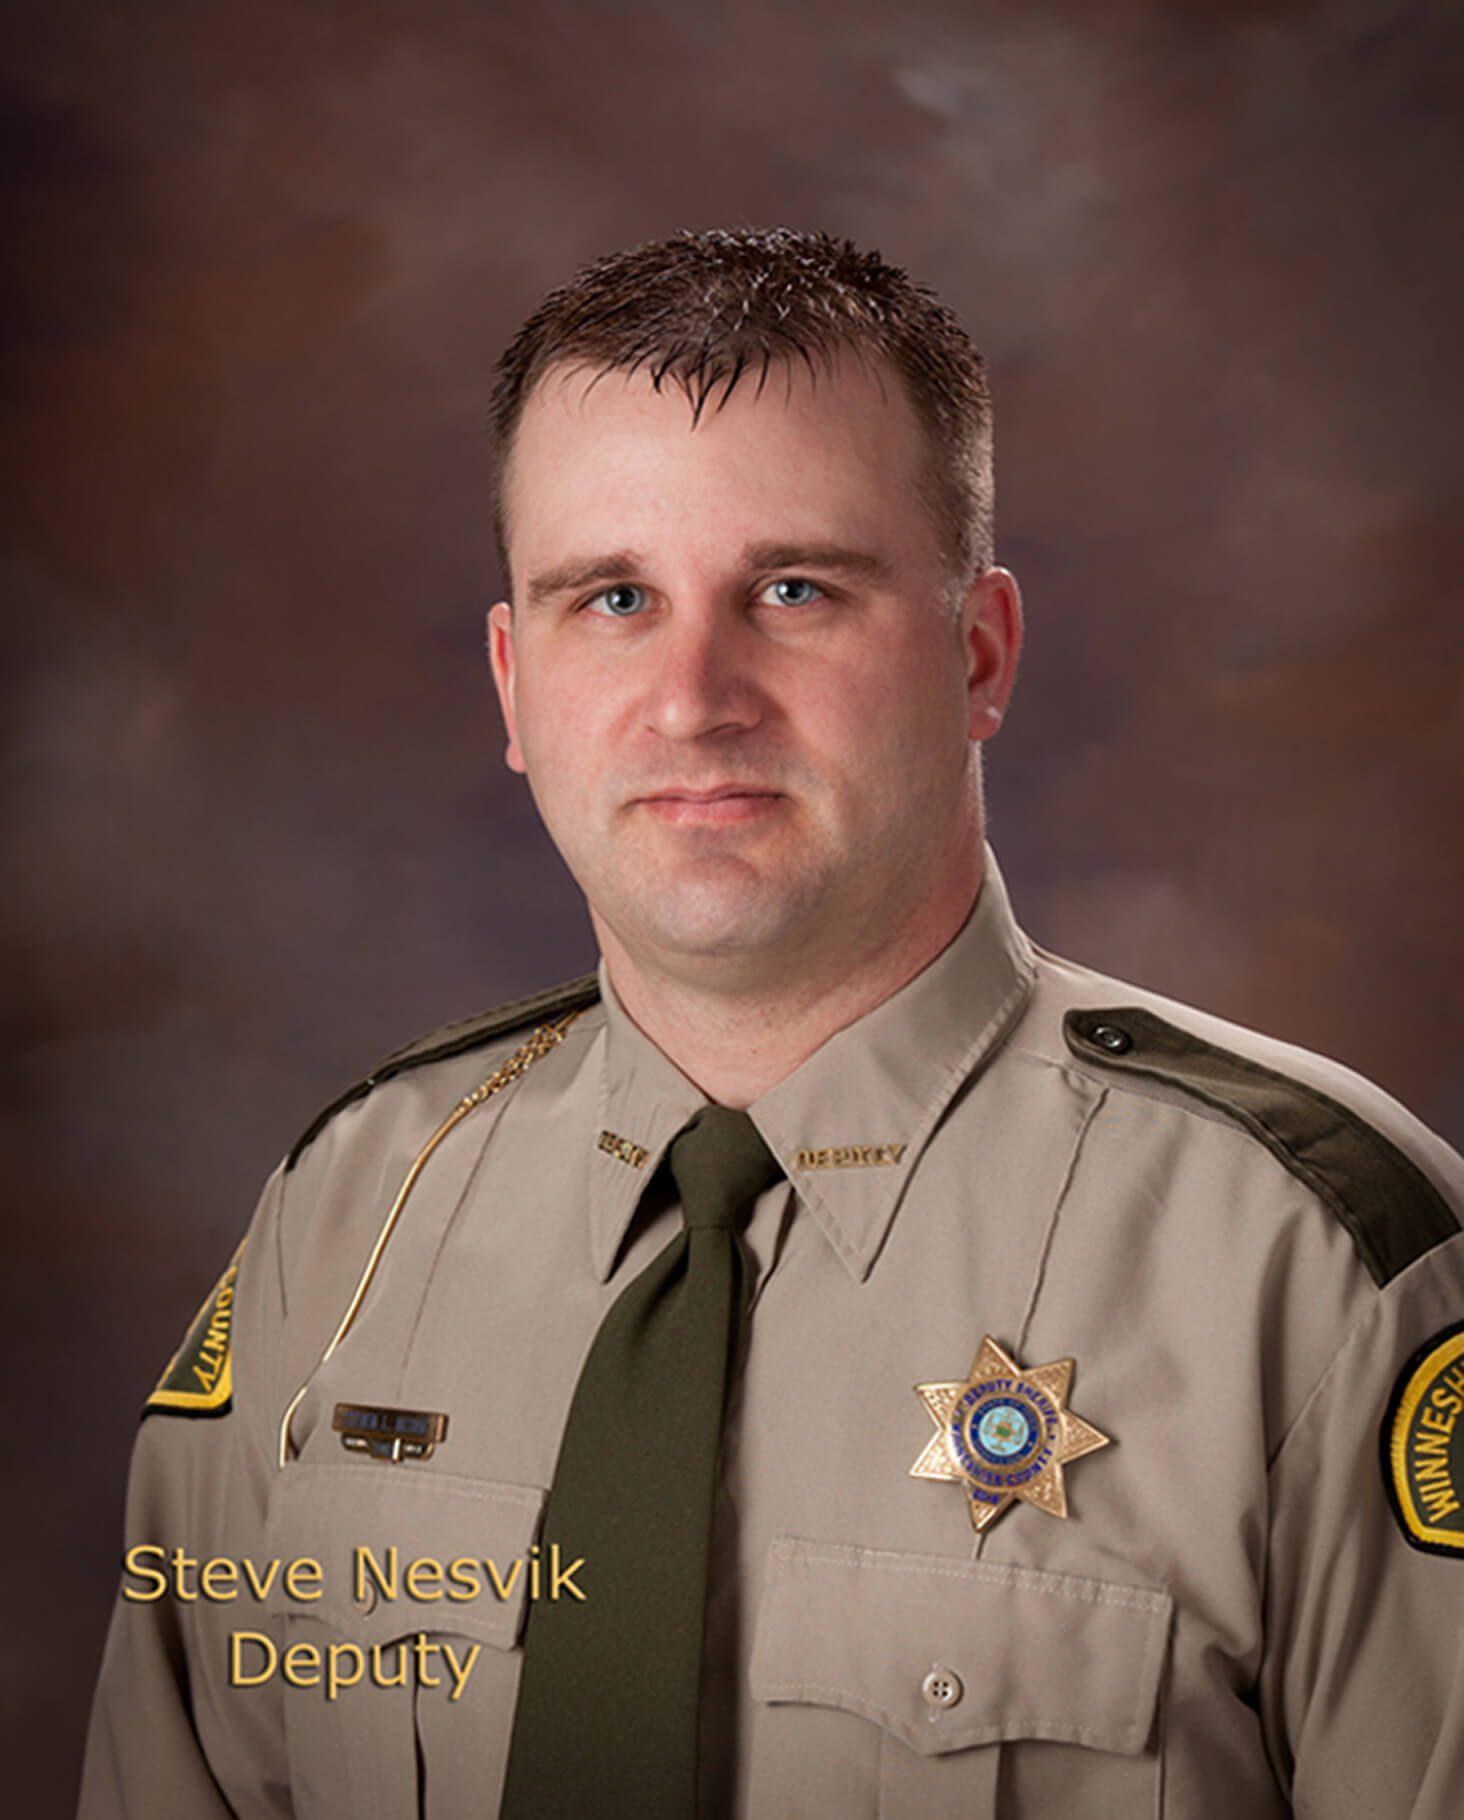 Steve Nesvik, Lieutenant/Second Deputy & K9 Deputy Sheriff